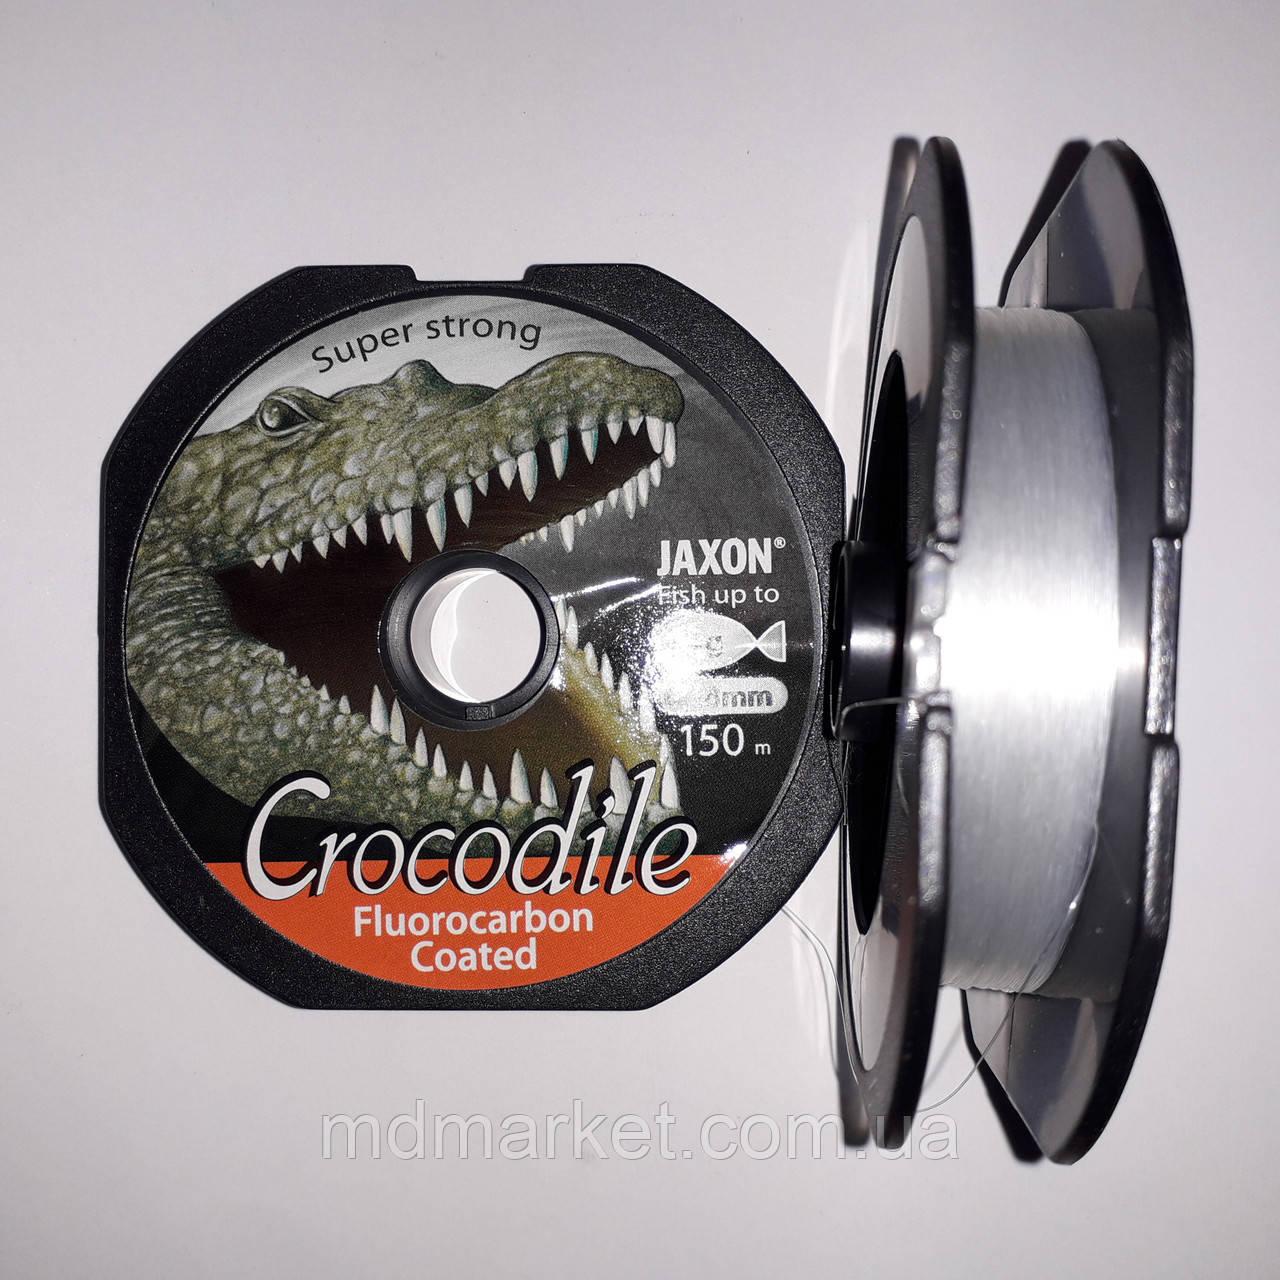 Jaxon Crocodile Fluorocarbon Coated 150m 0.27mm/14kg